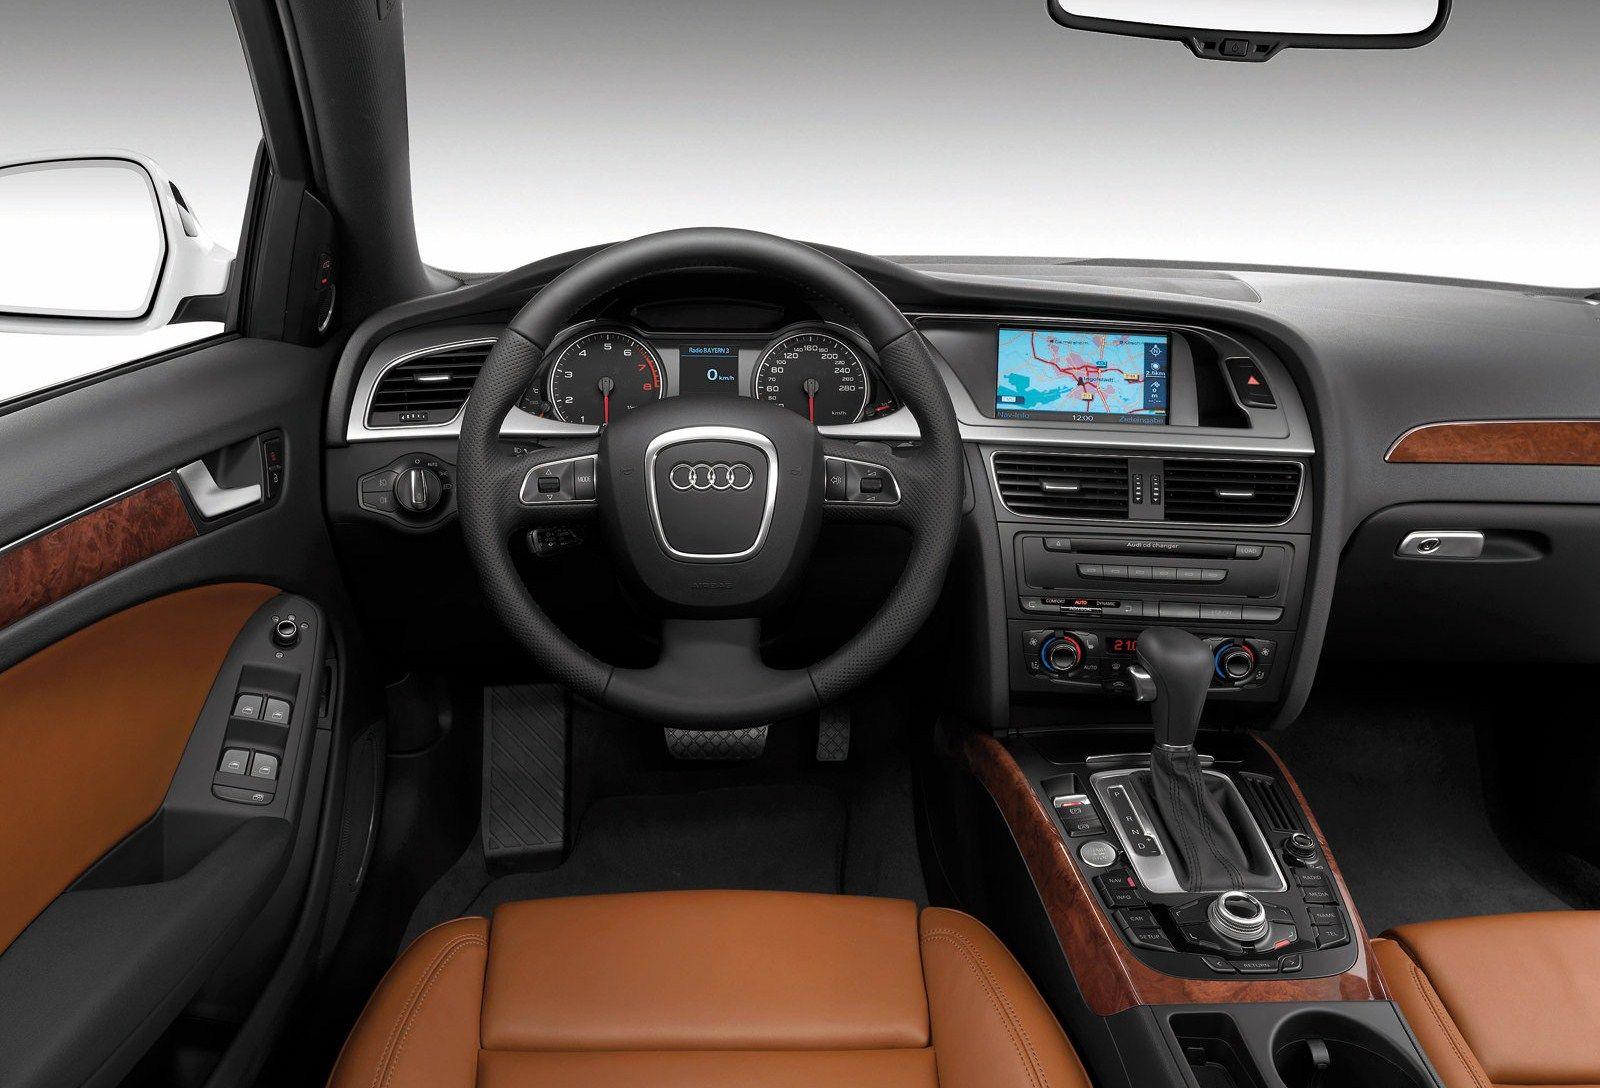 Audi A4 Interior Hd Wallpaper | Audi Wallpapers | Pinterest | Audi ...